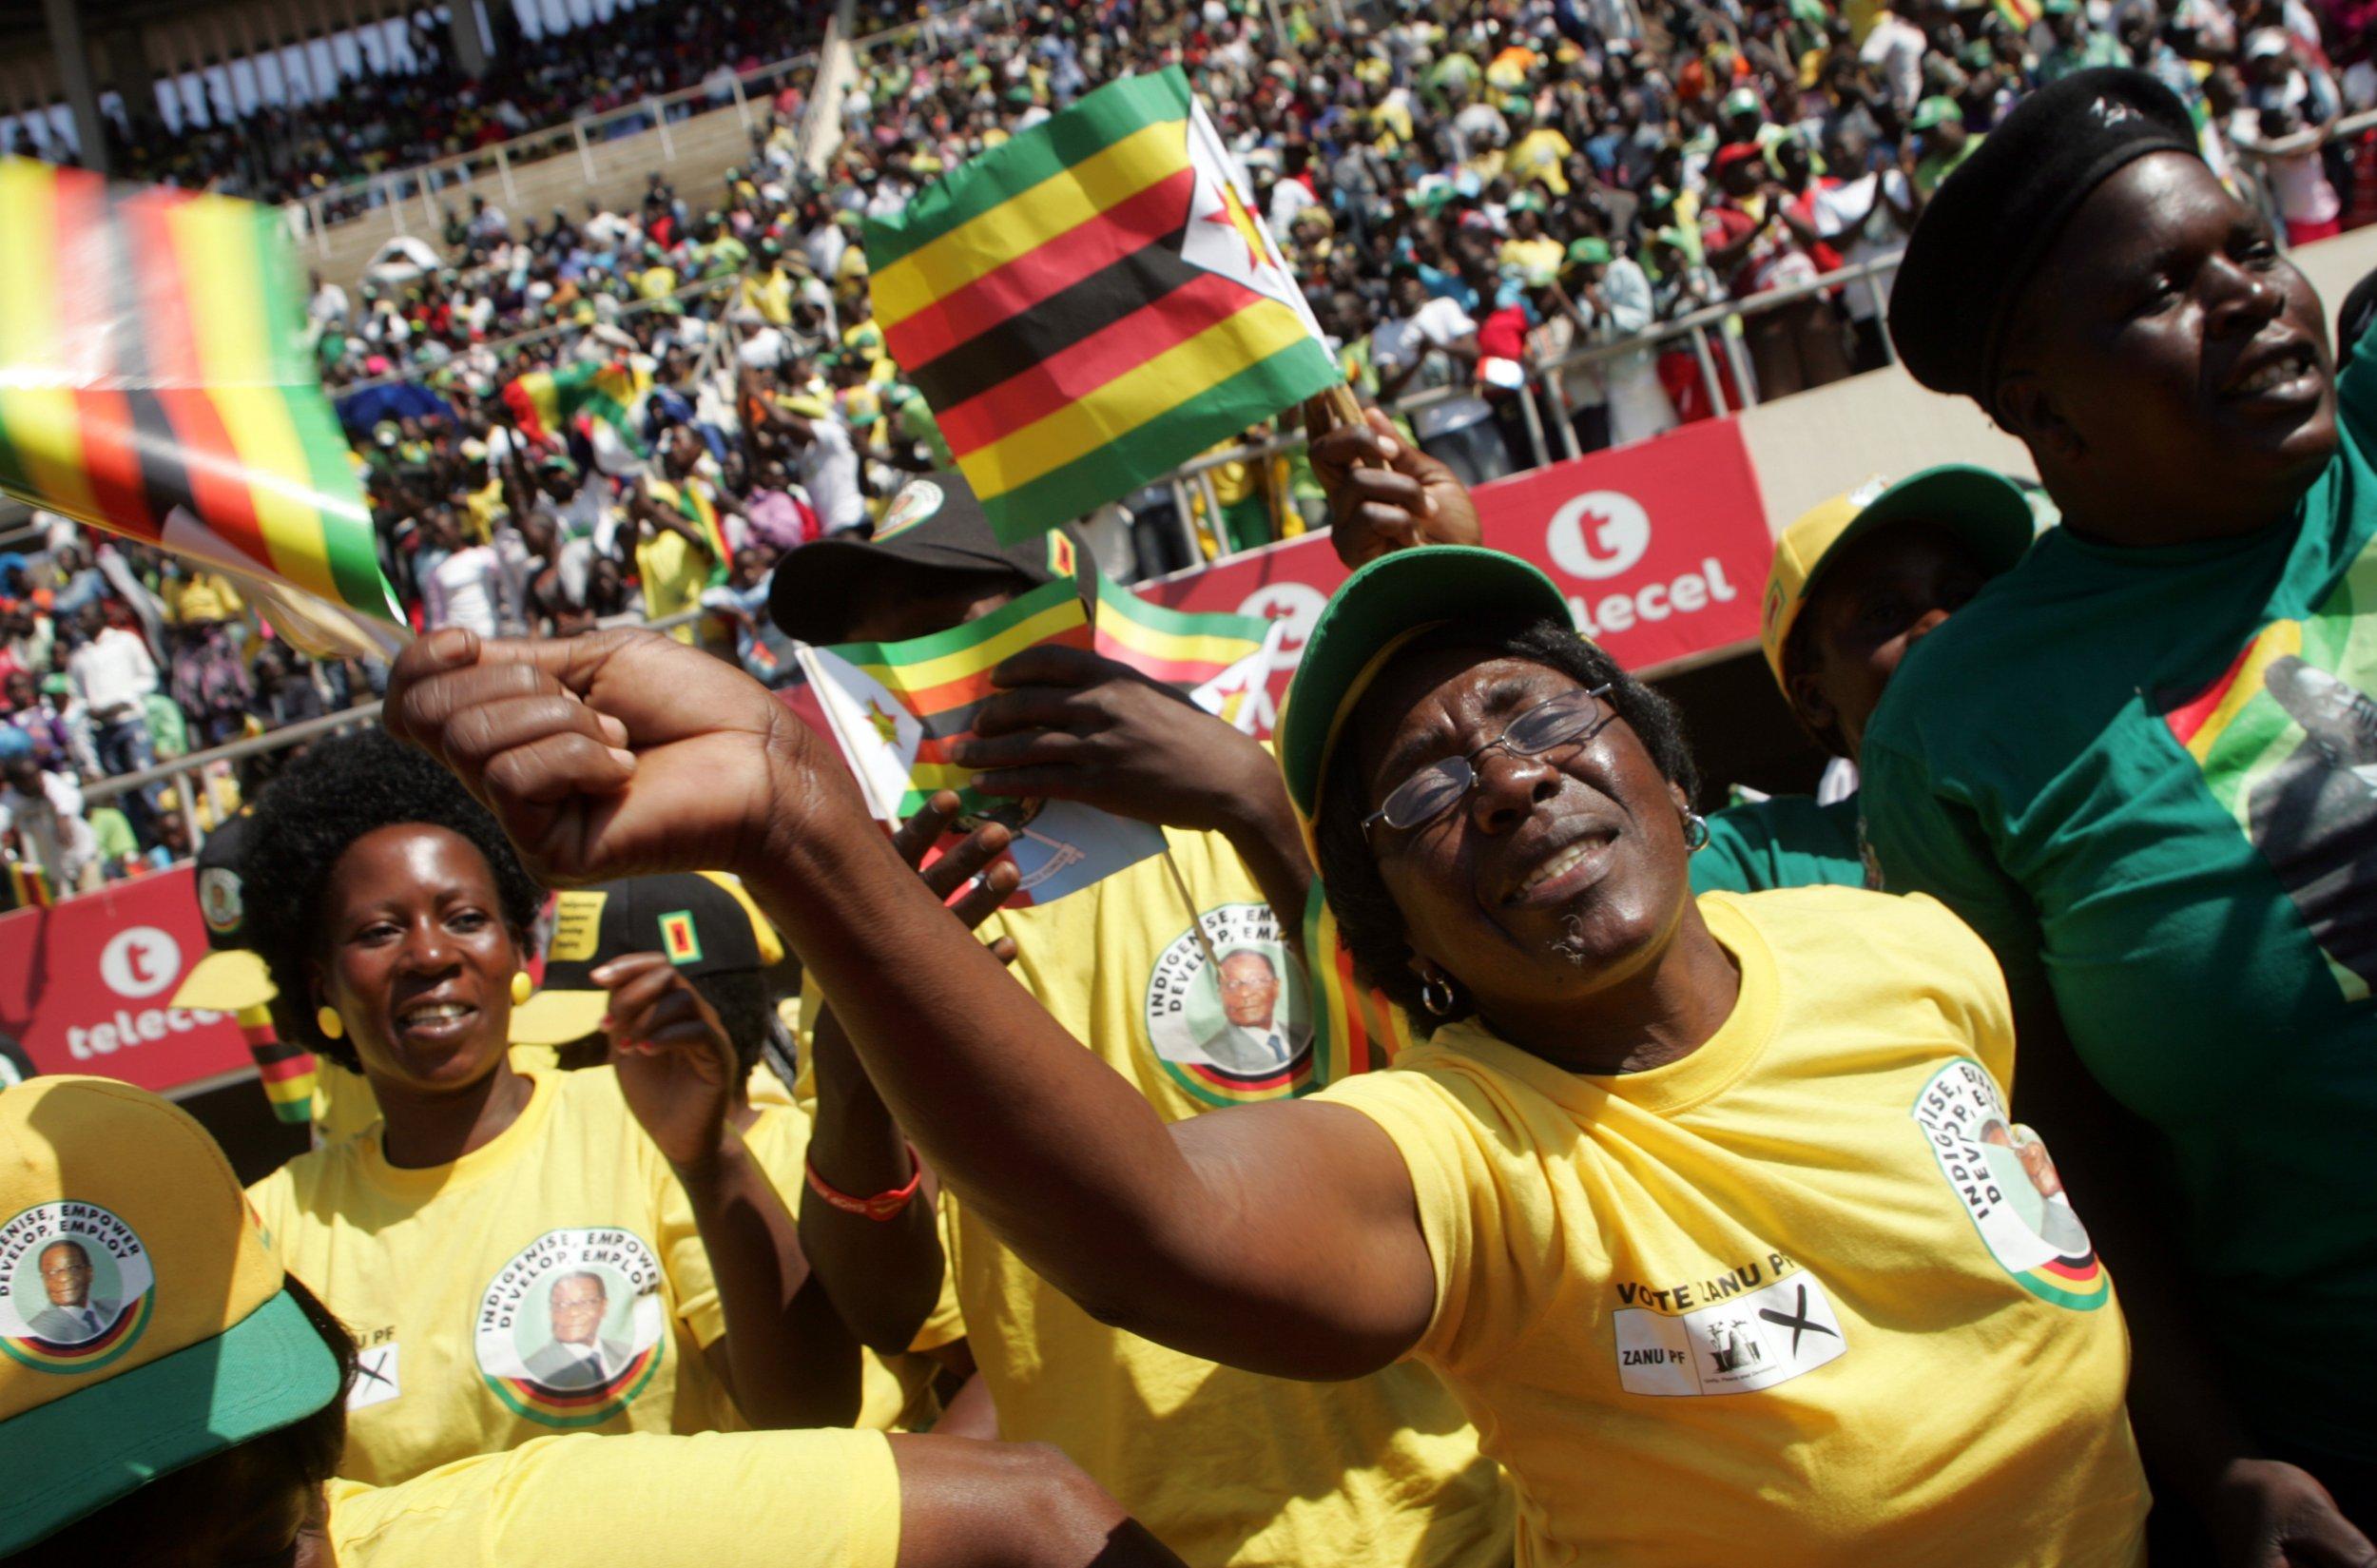 Supporters of Zimbabwe President Robert Mugabe cheer.